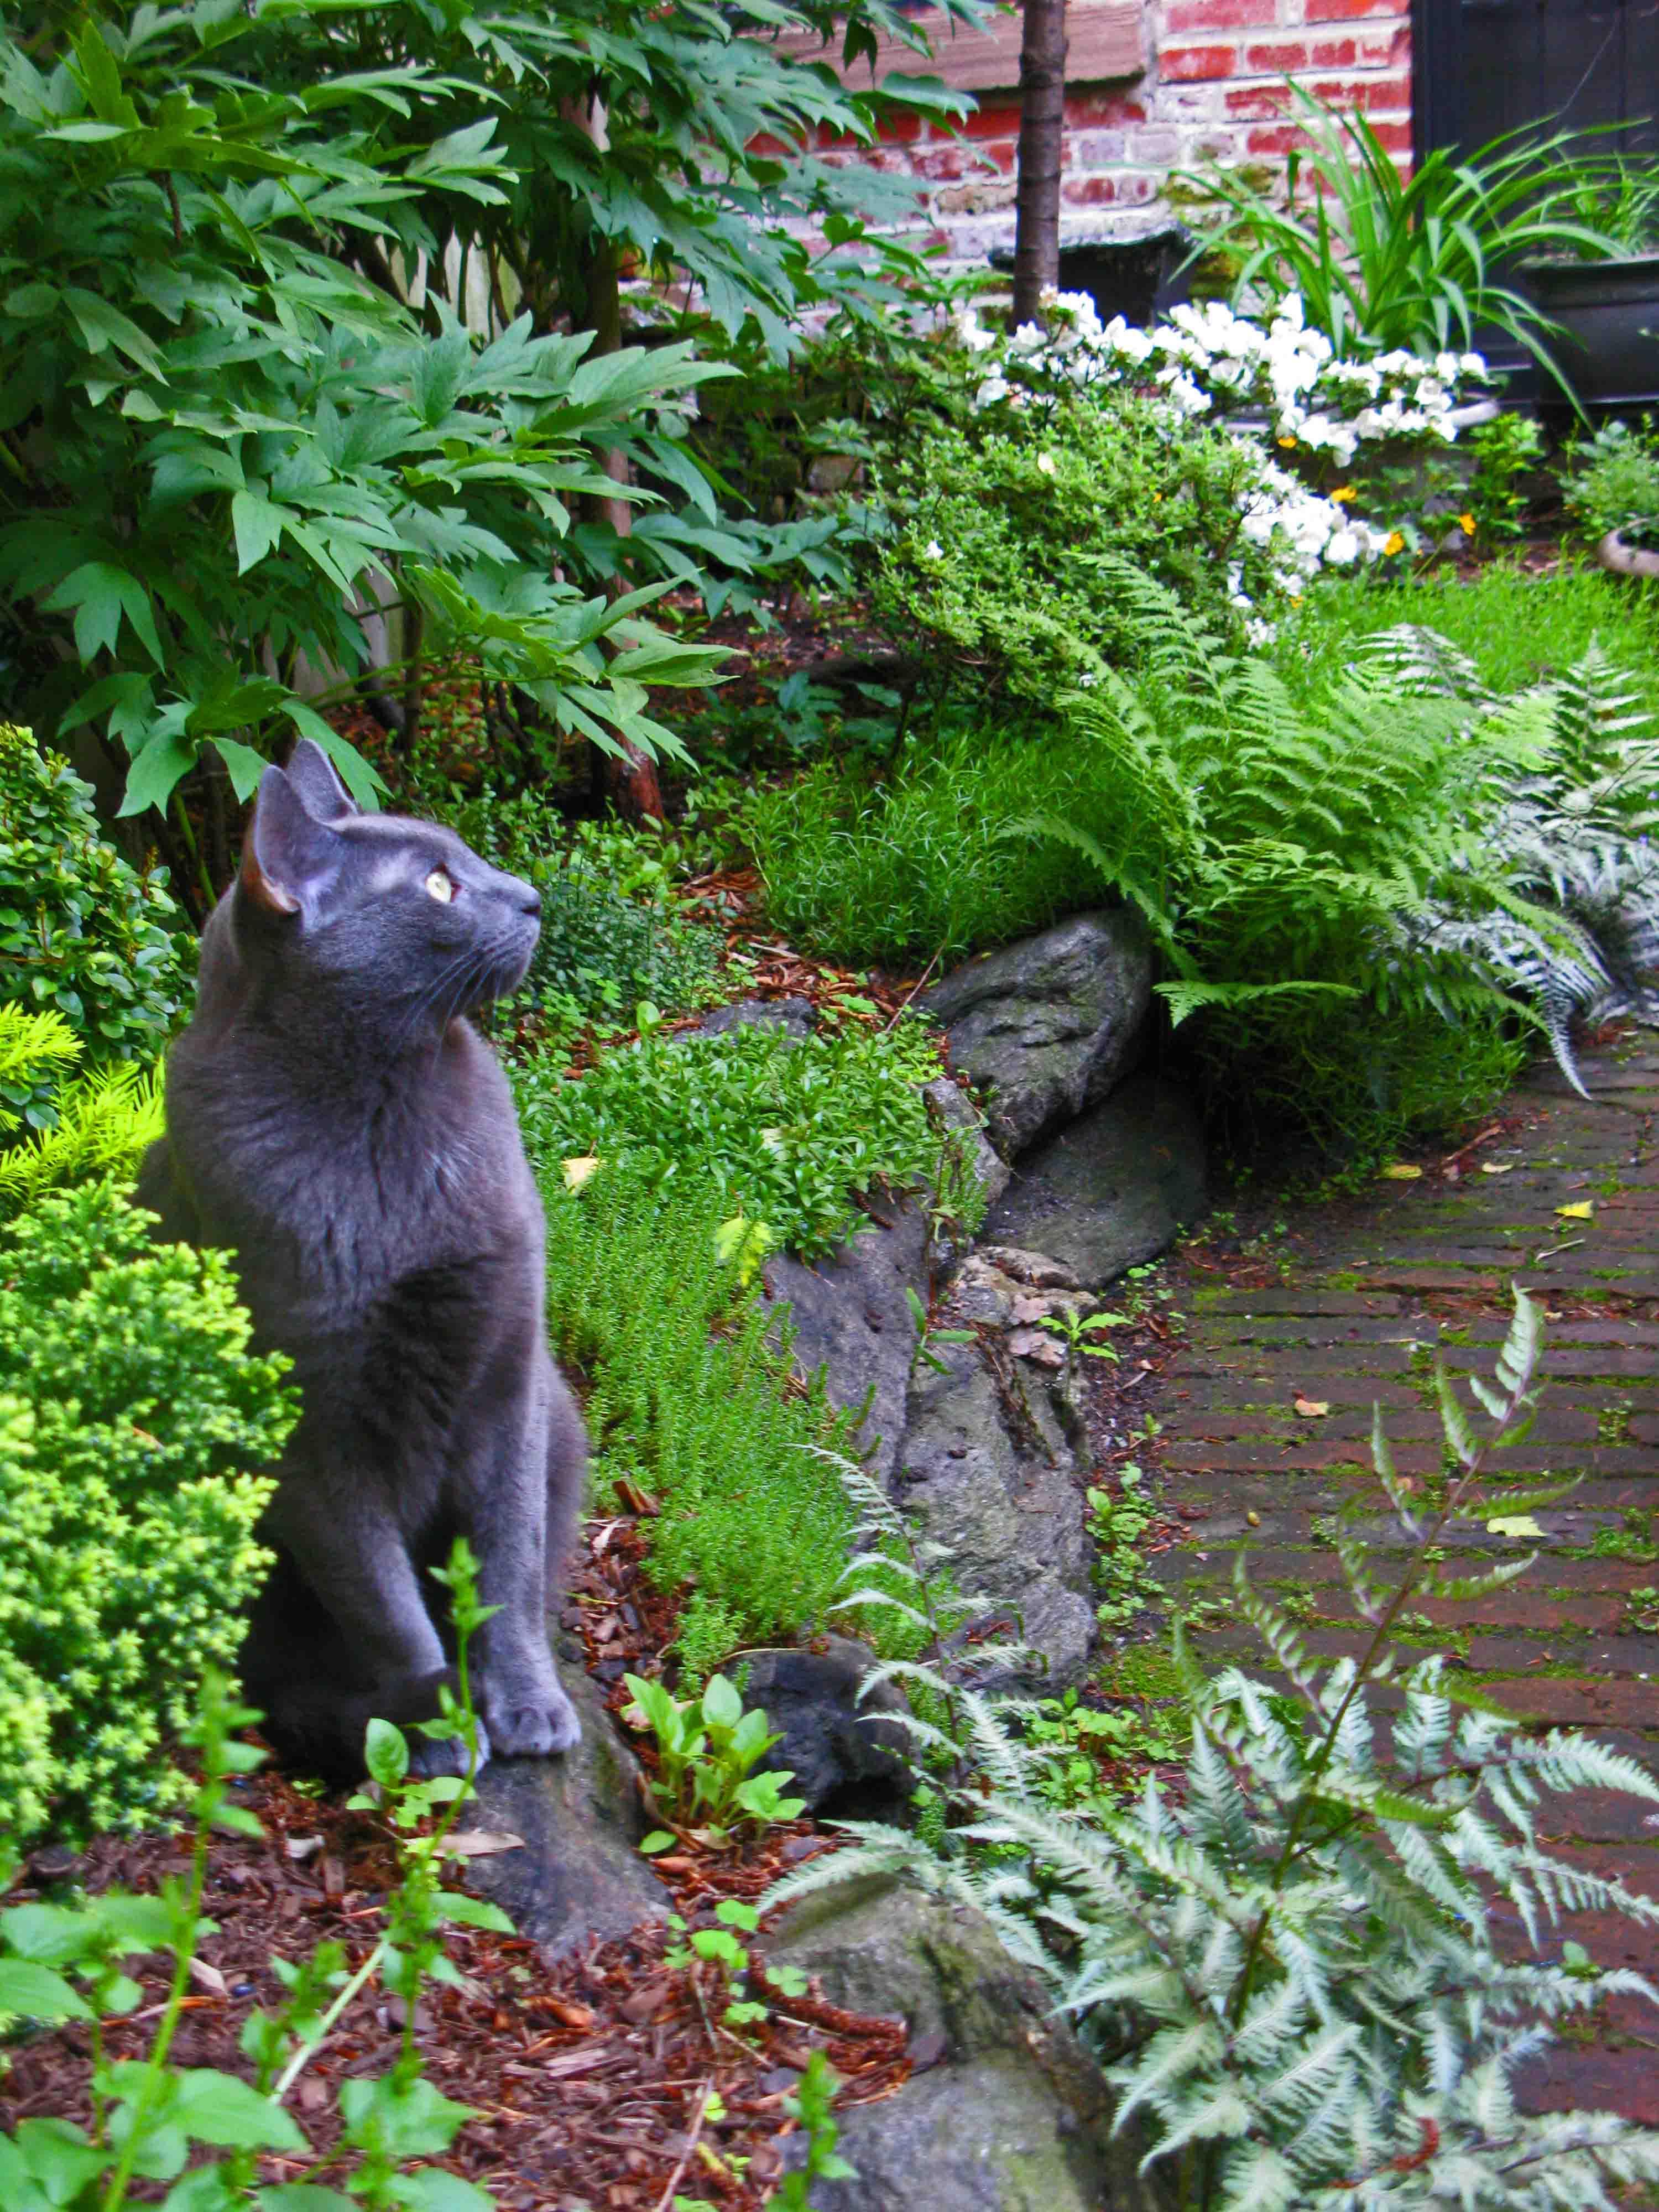 outdoor animals gallery dogs plasterwareintagliosmouldsplaques interiors craft uk cats plaster statues garden ornaments statue cat home decoration figurines